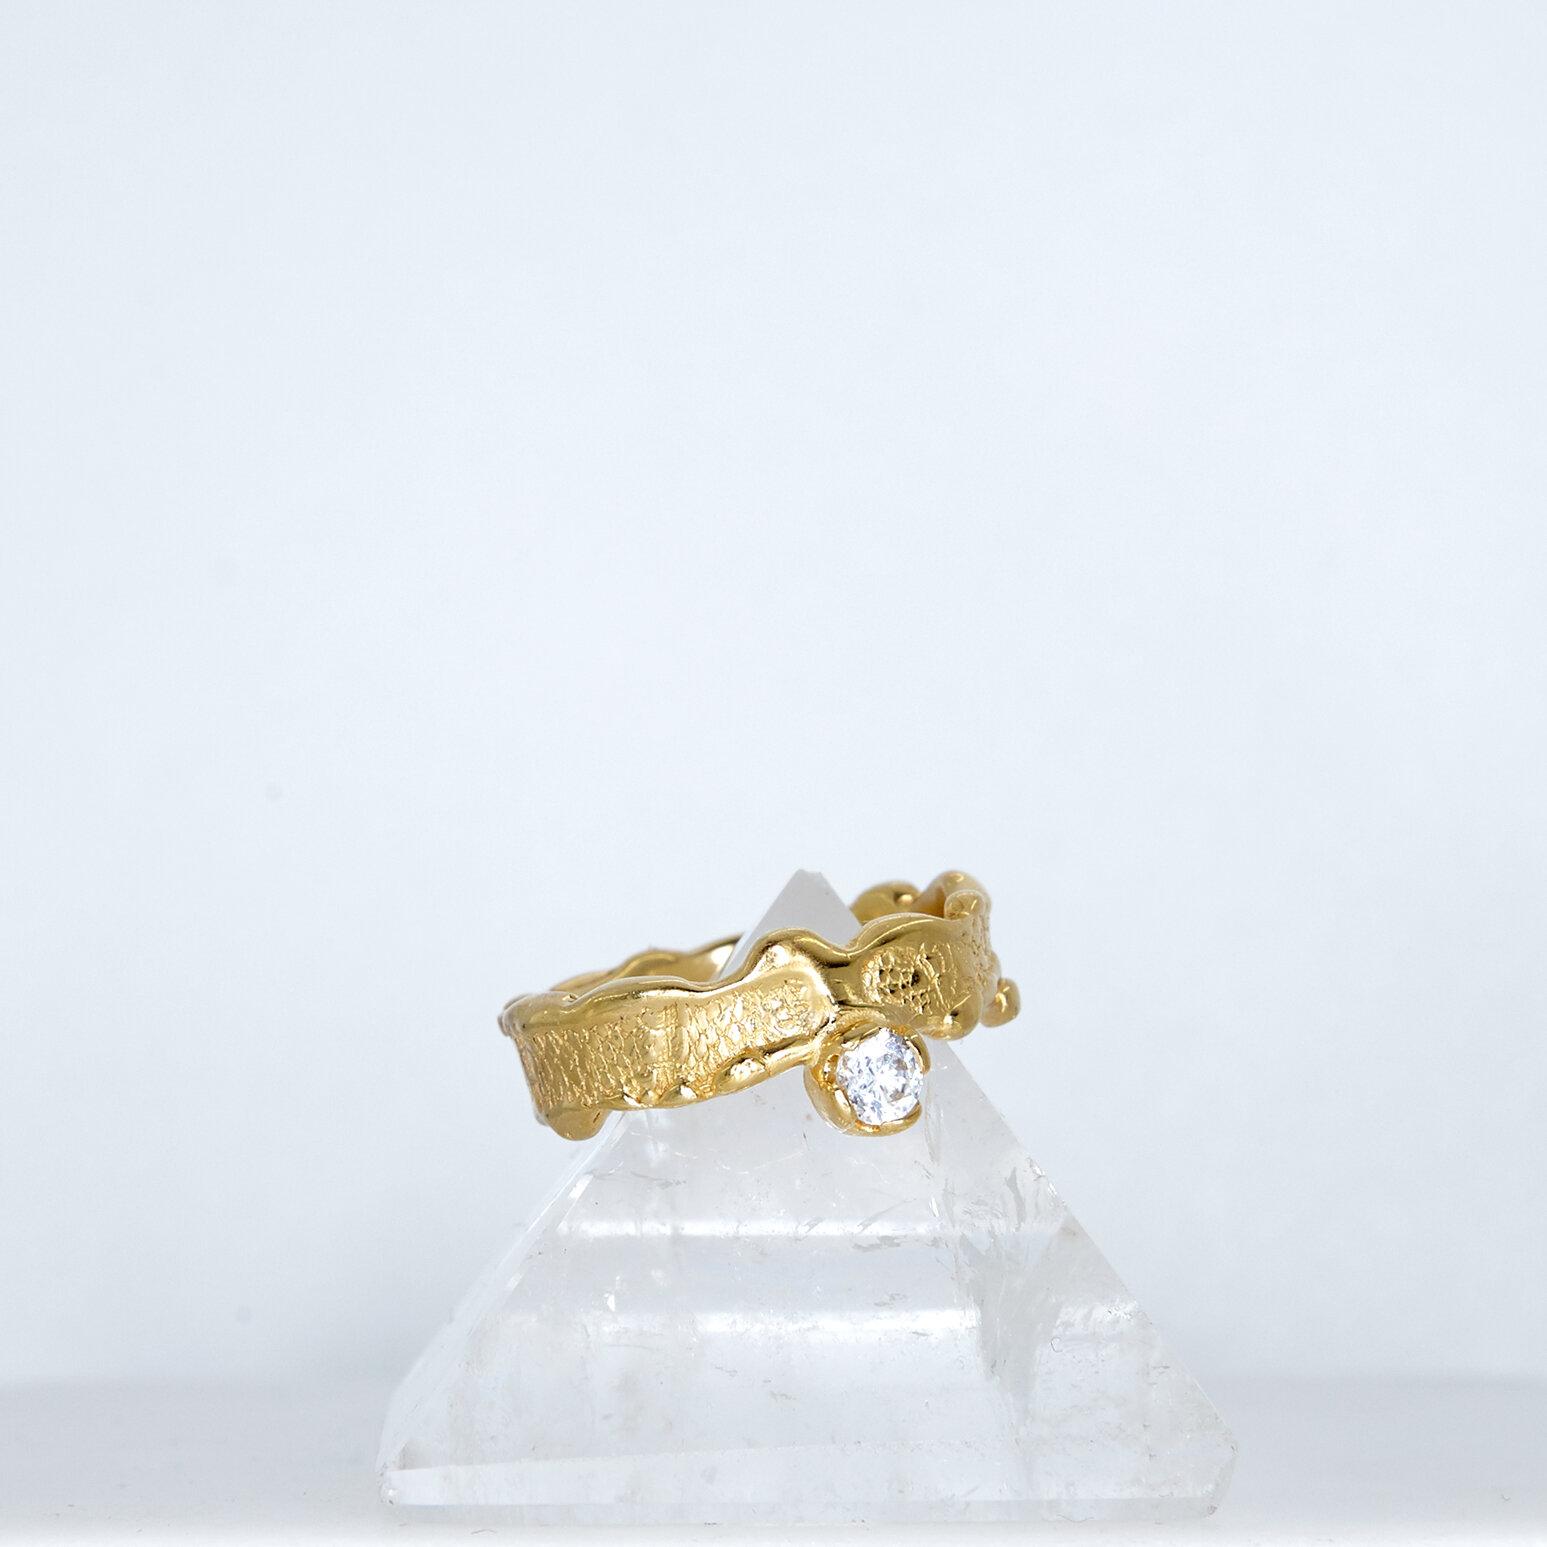 clara-jasmine-NAYA-bague-diamant-mariage-fashion.jpg